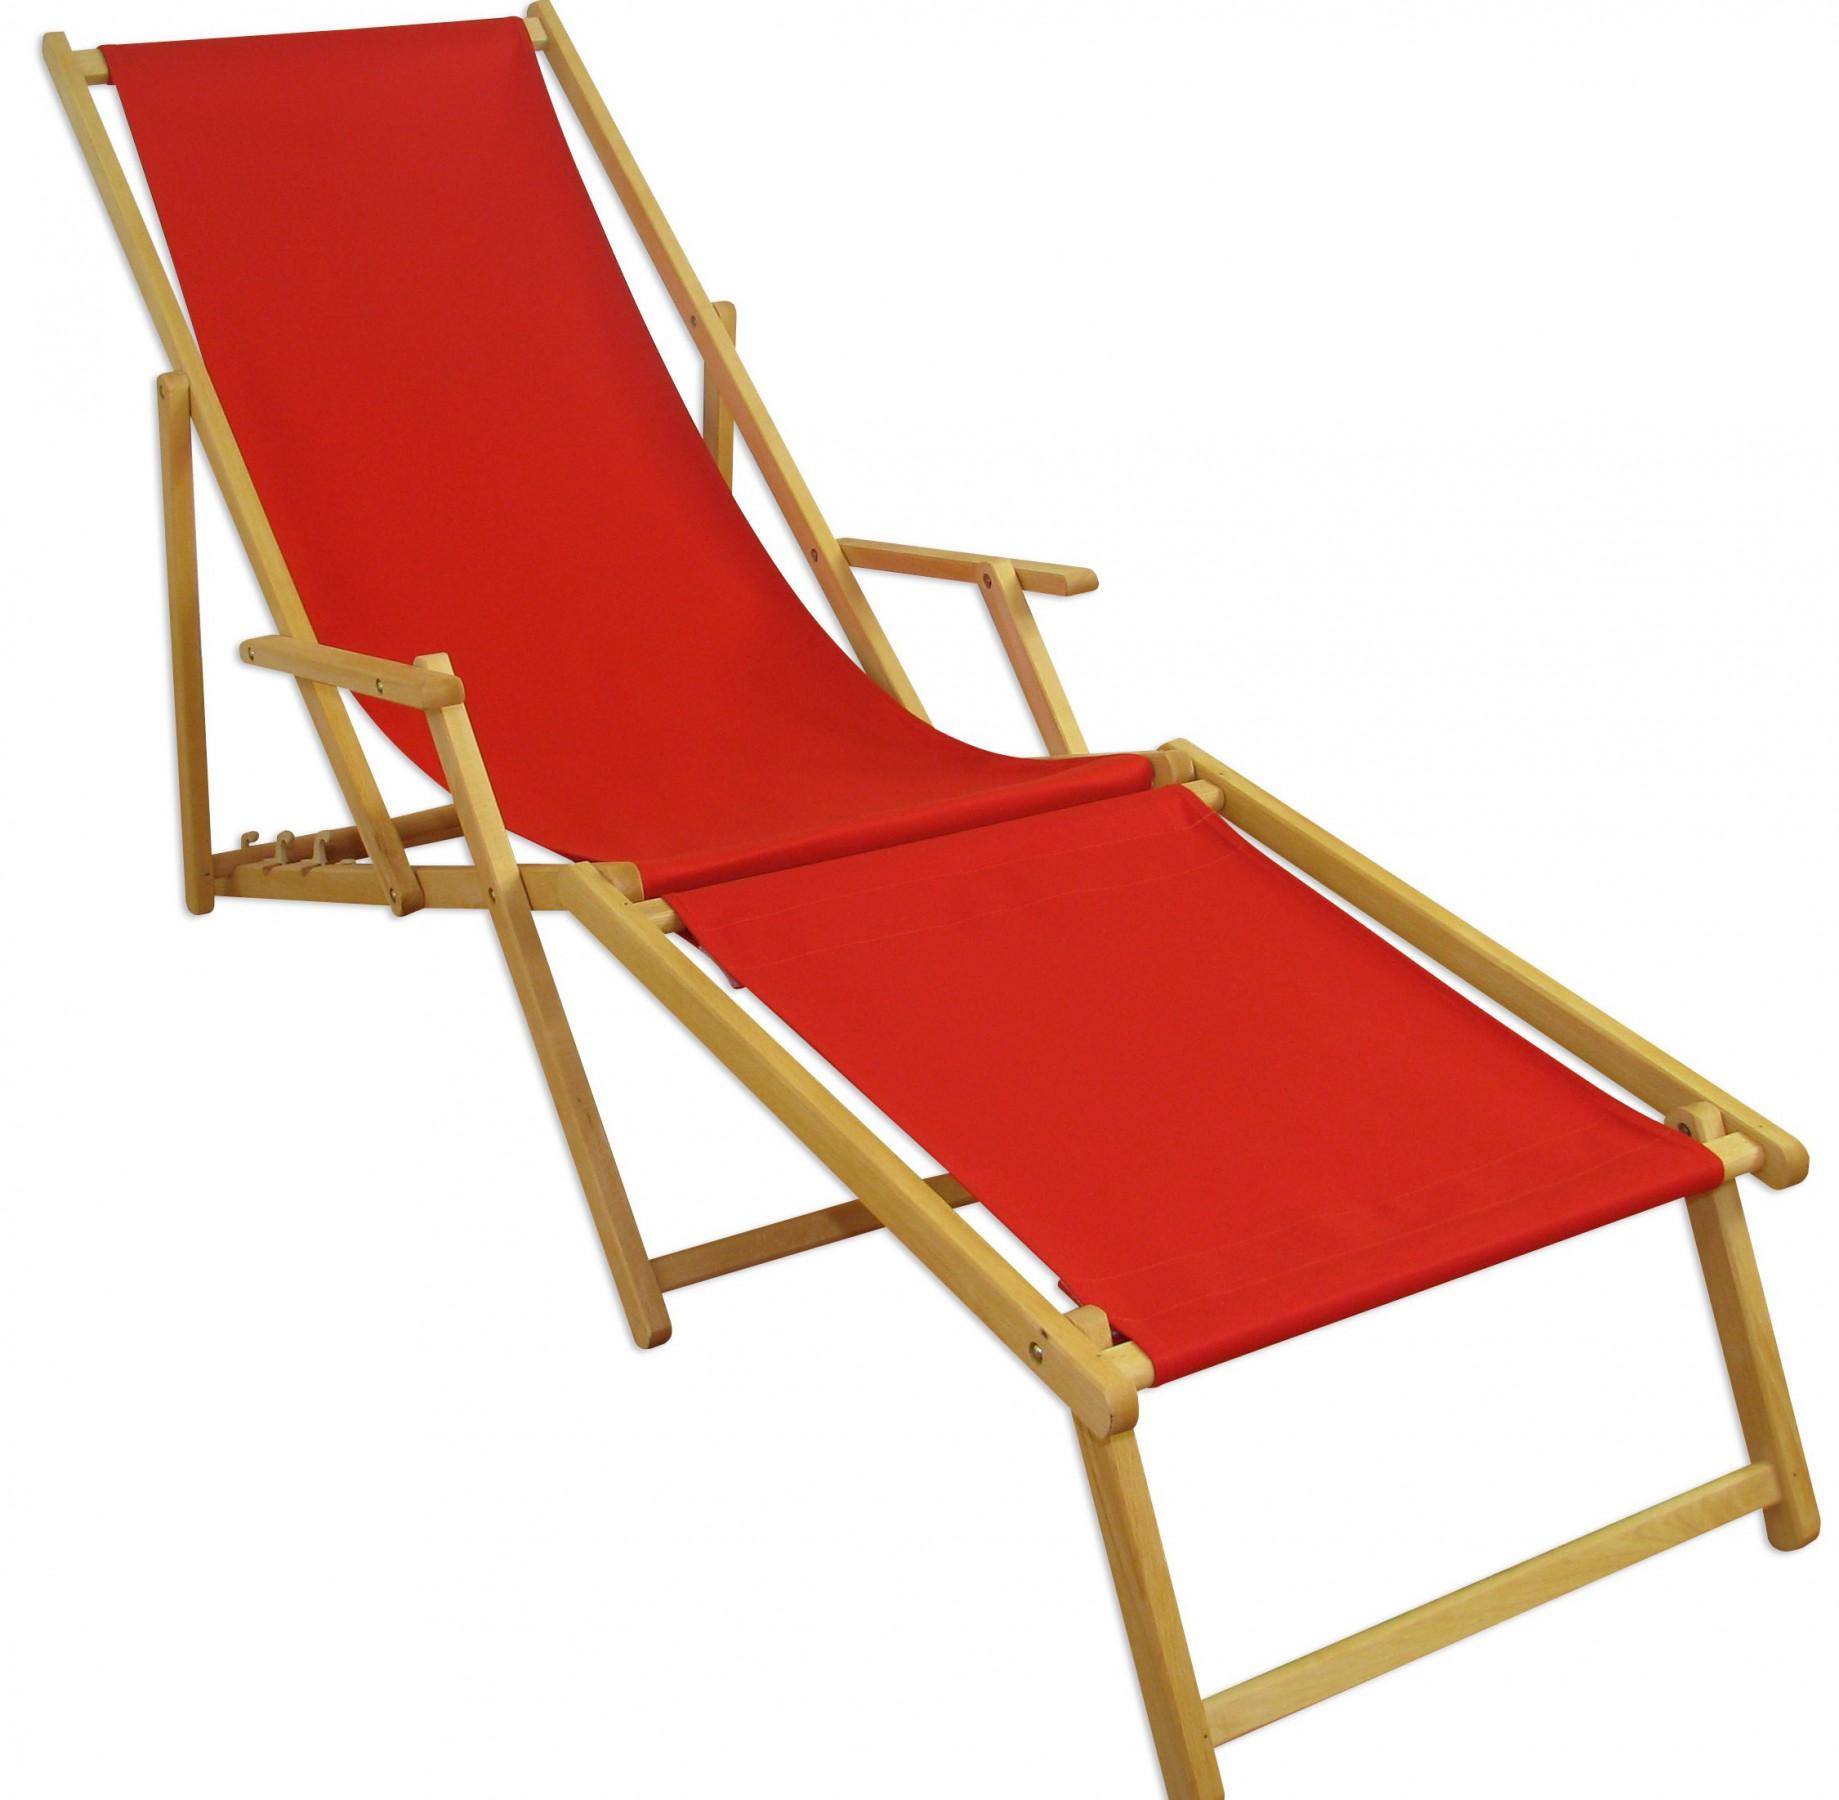 Full Size of Gartenliege Klappbar Sonnenliege Rot Futeil Sonnendach Kissen 10 Bett Ausklappbar Ausklappbares Wohnzimmer Gartenliege Klappbar